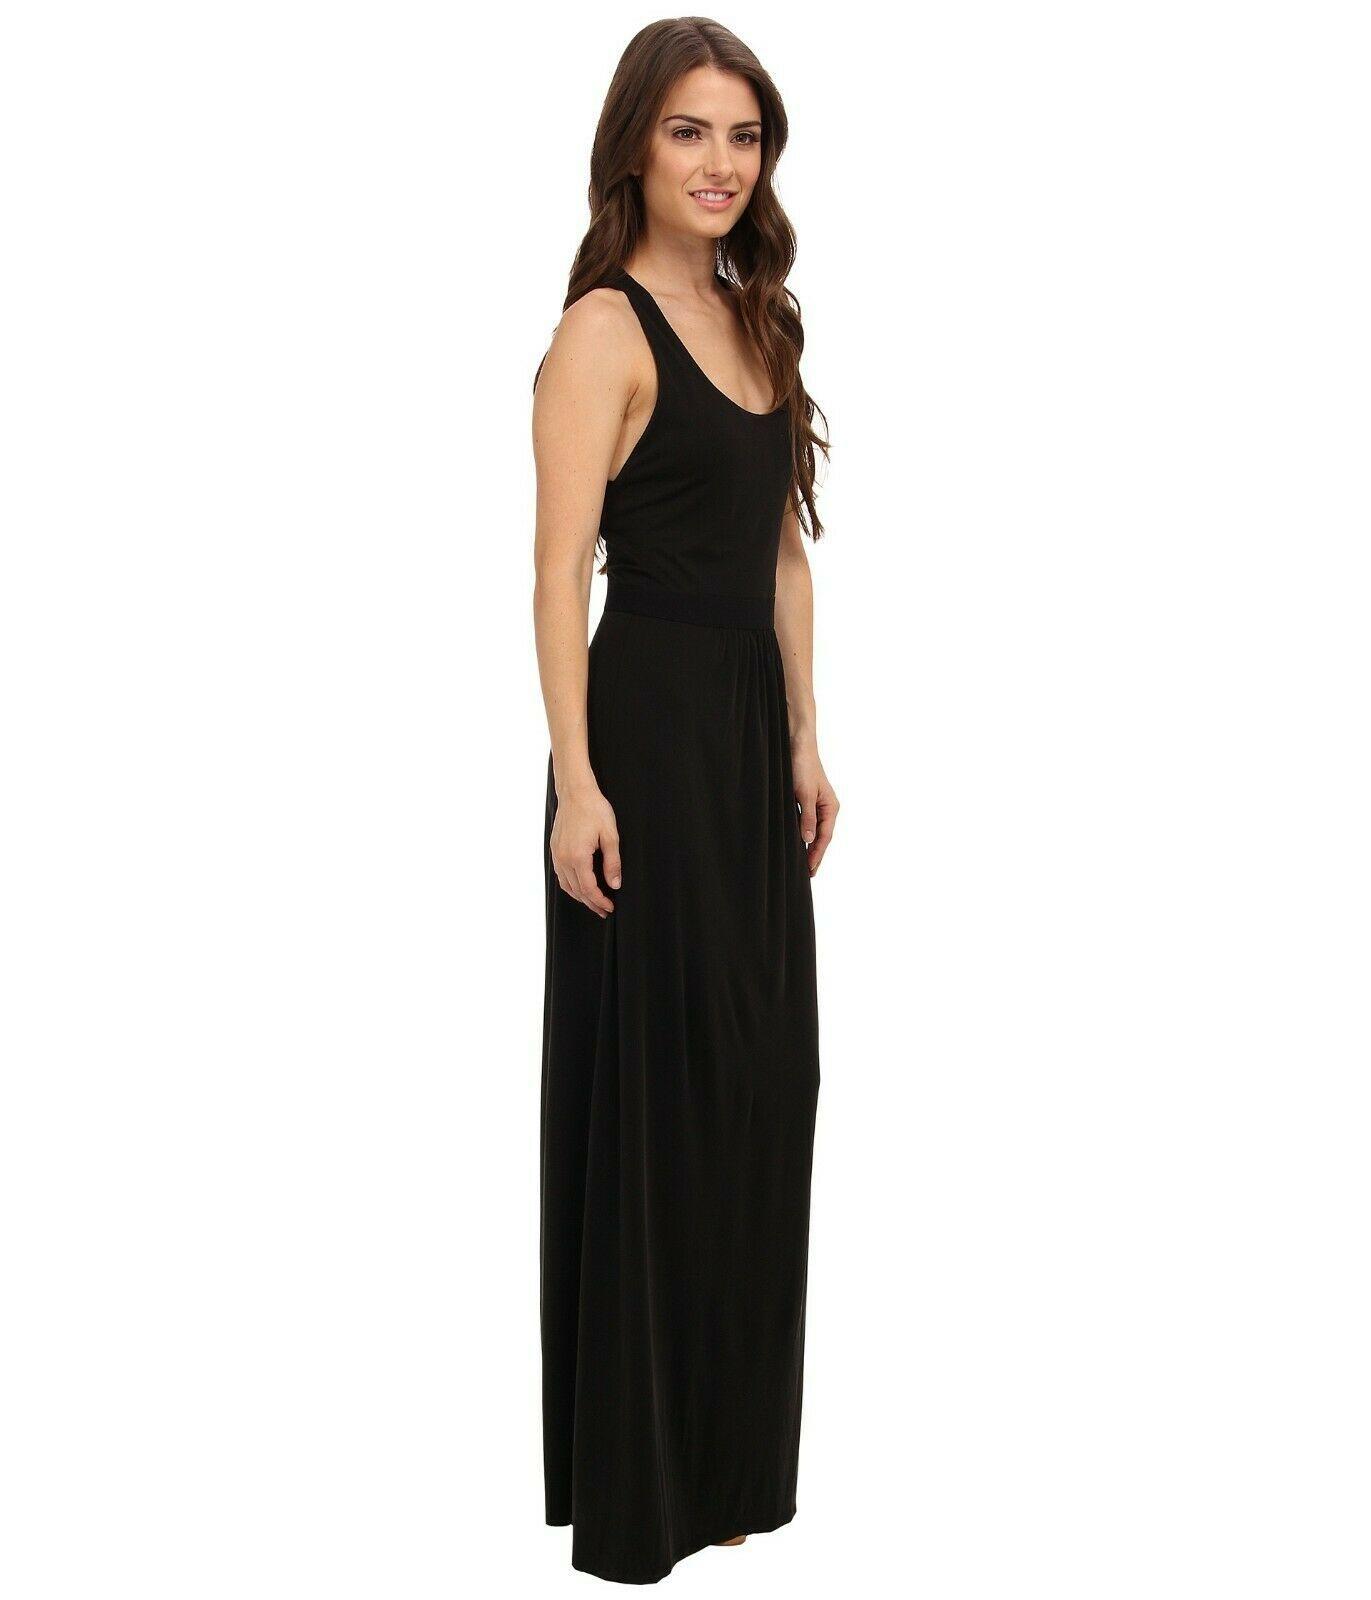 NWT $158 BCBGMAXAZRIA BCBG Adriene Dress PM  6P - 8P